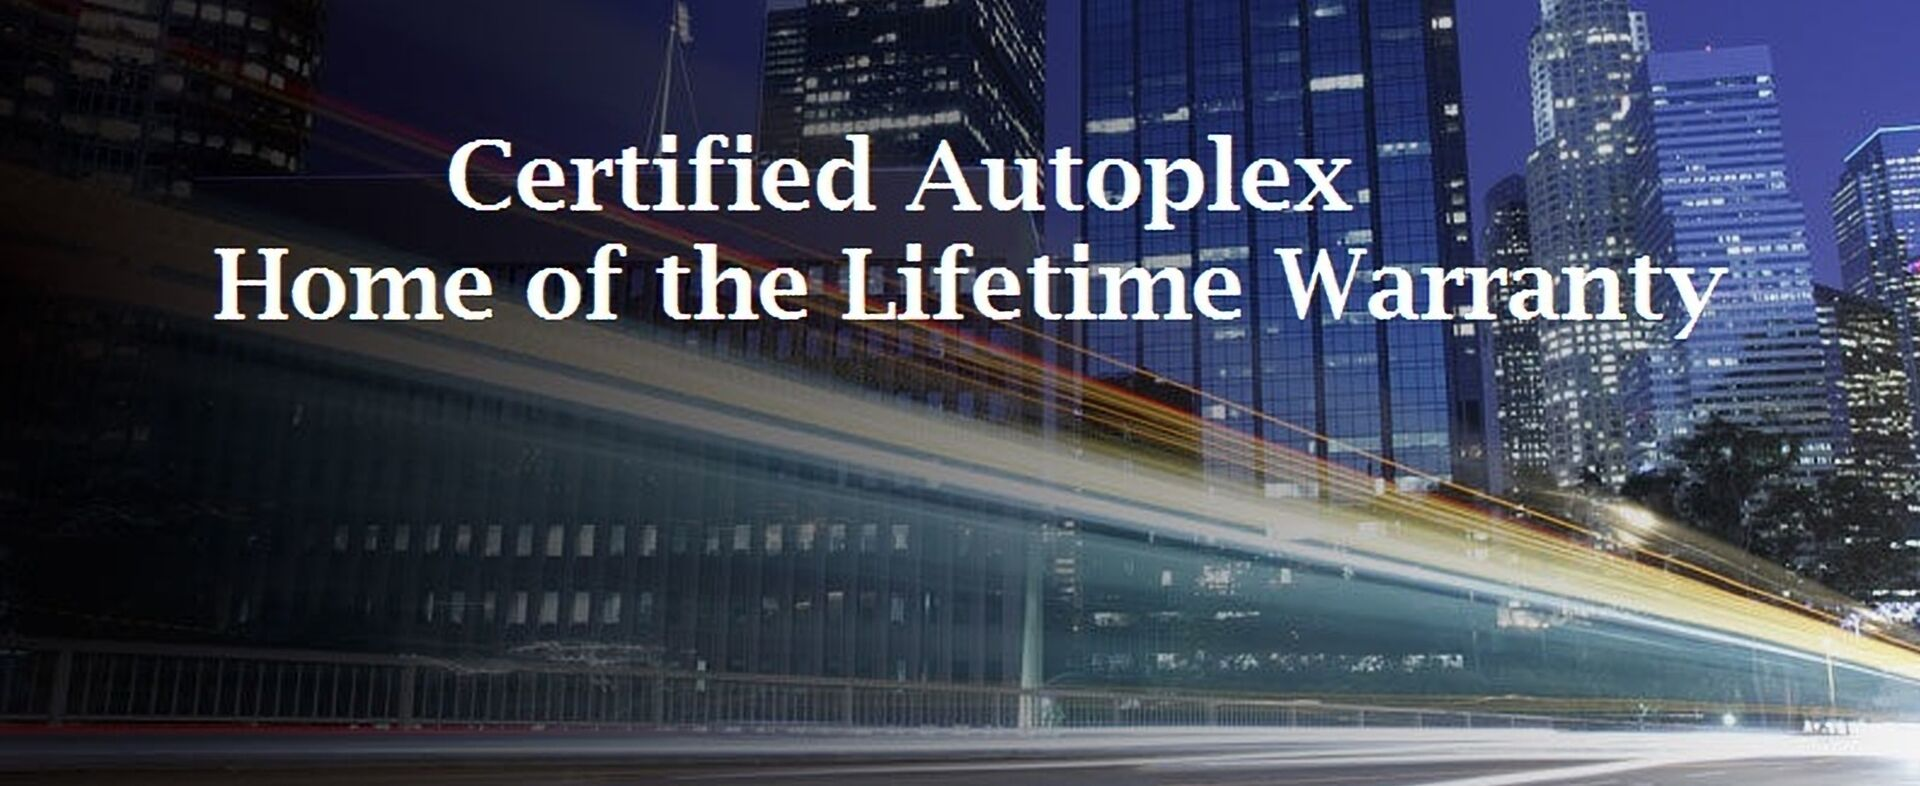 Used Car Dealership Carrollton TX Used Cars Certified Autoplex - Metroplex cadillac dealers